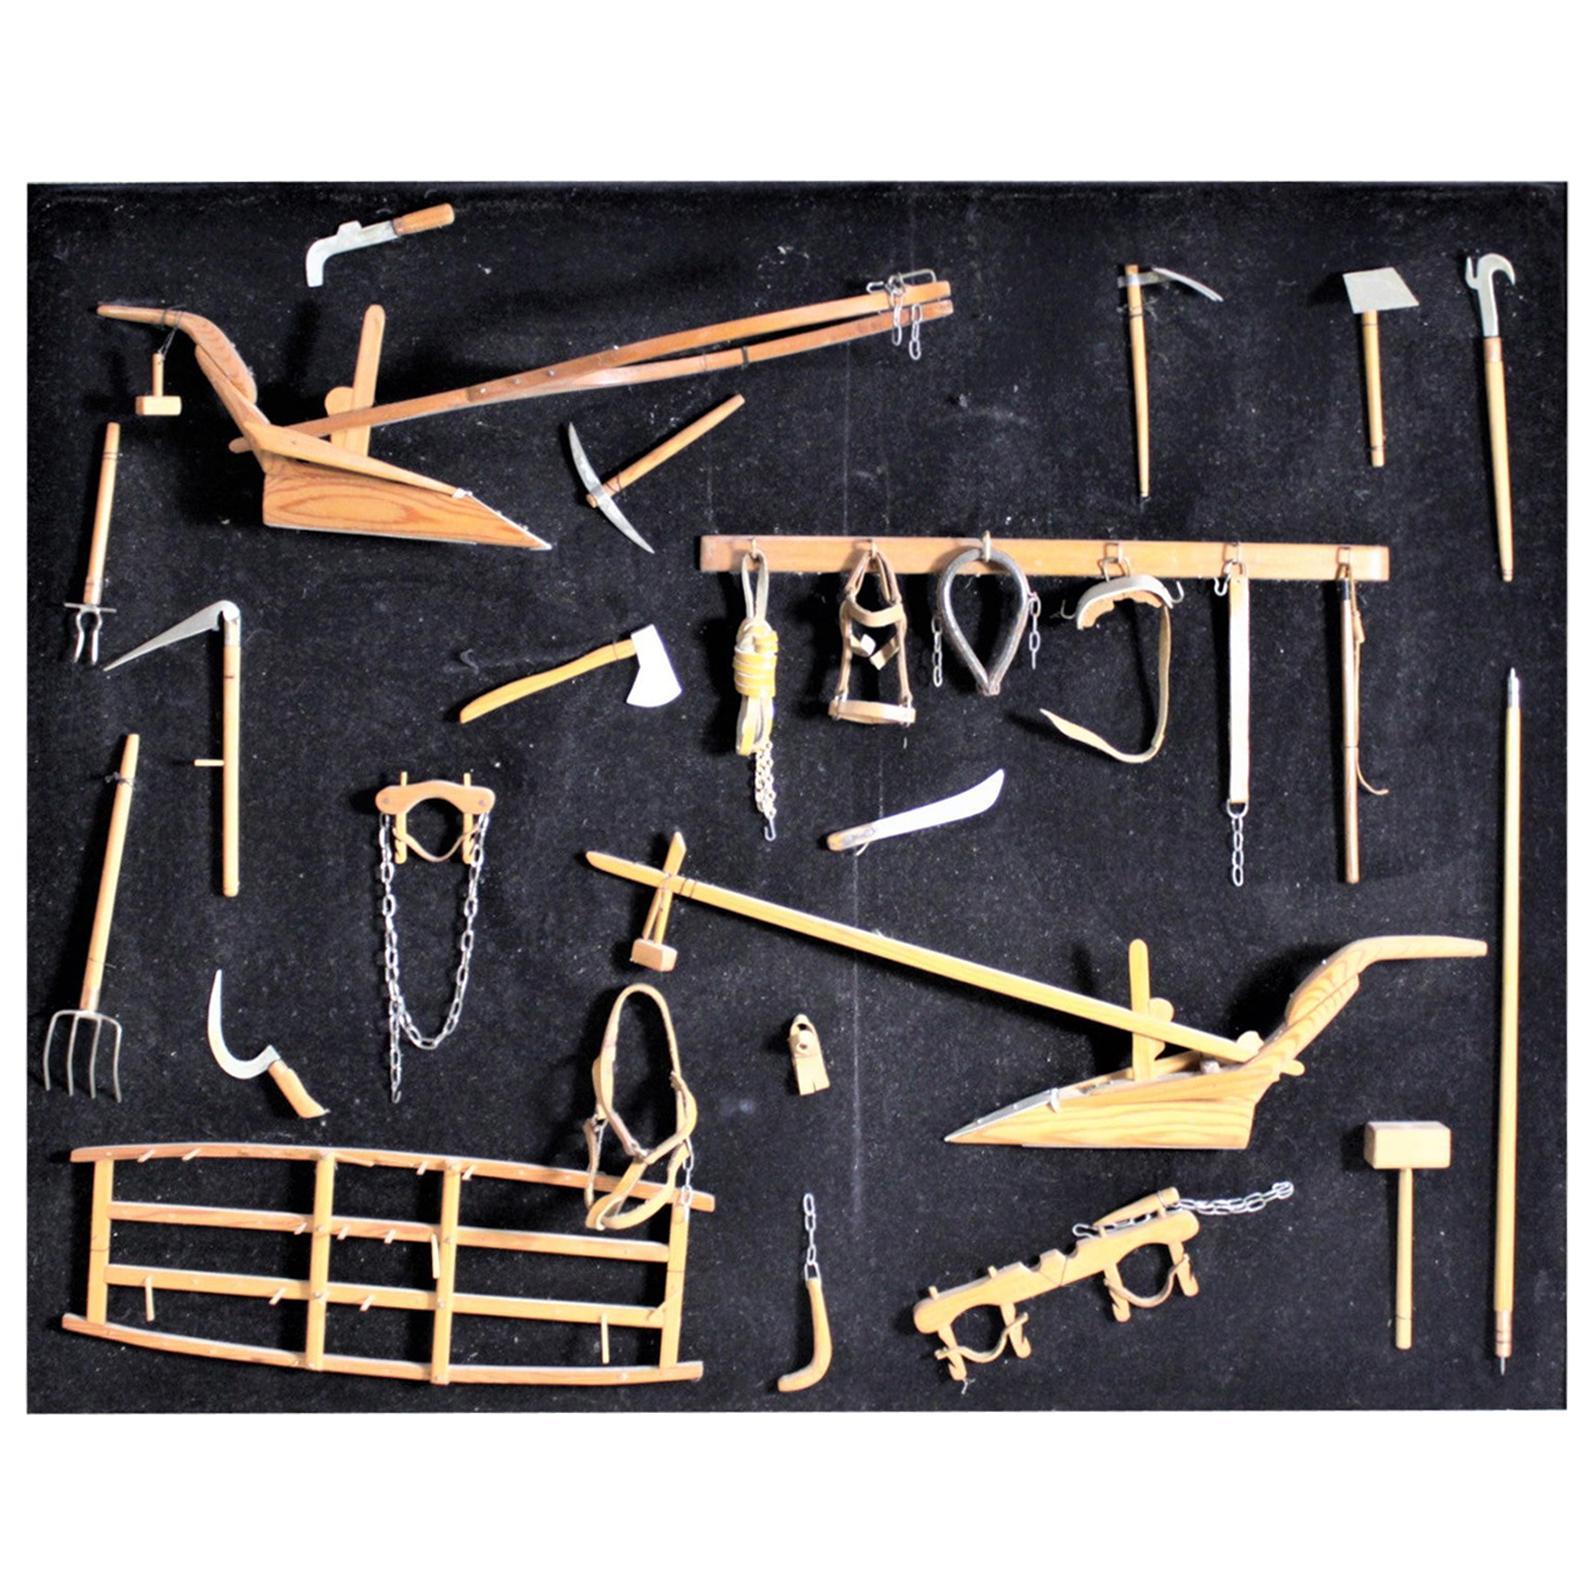 Midcentury Era Folk Art Made Collection of Miniature Antique Farm Implements